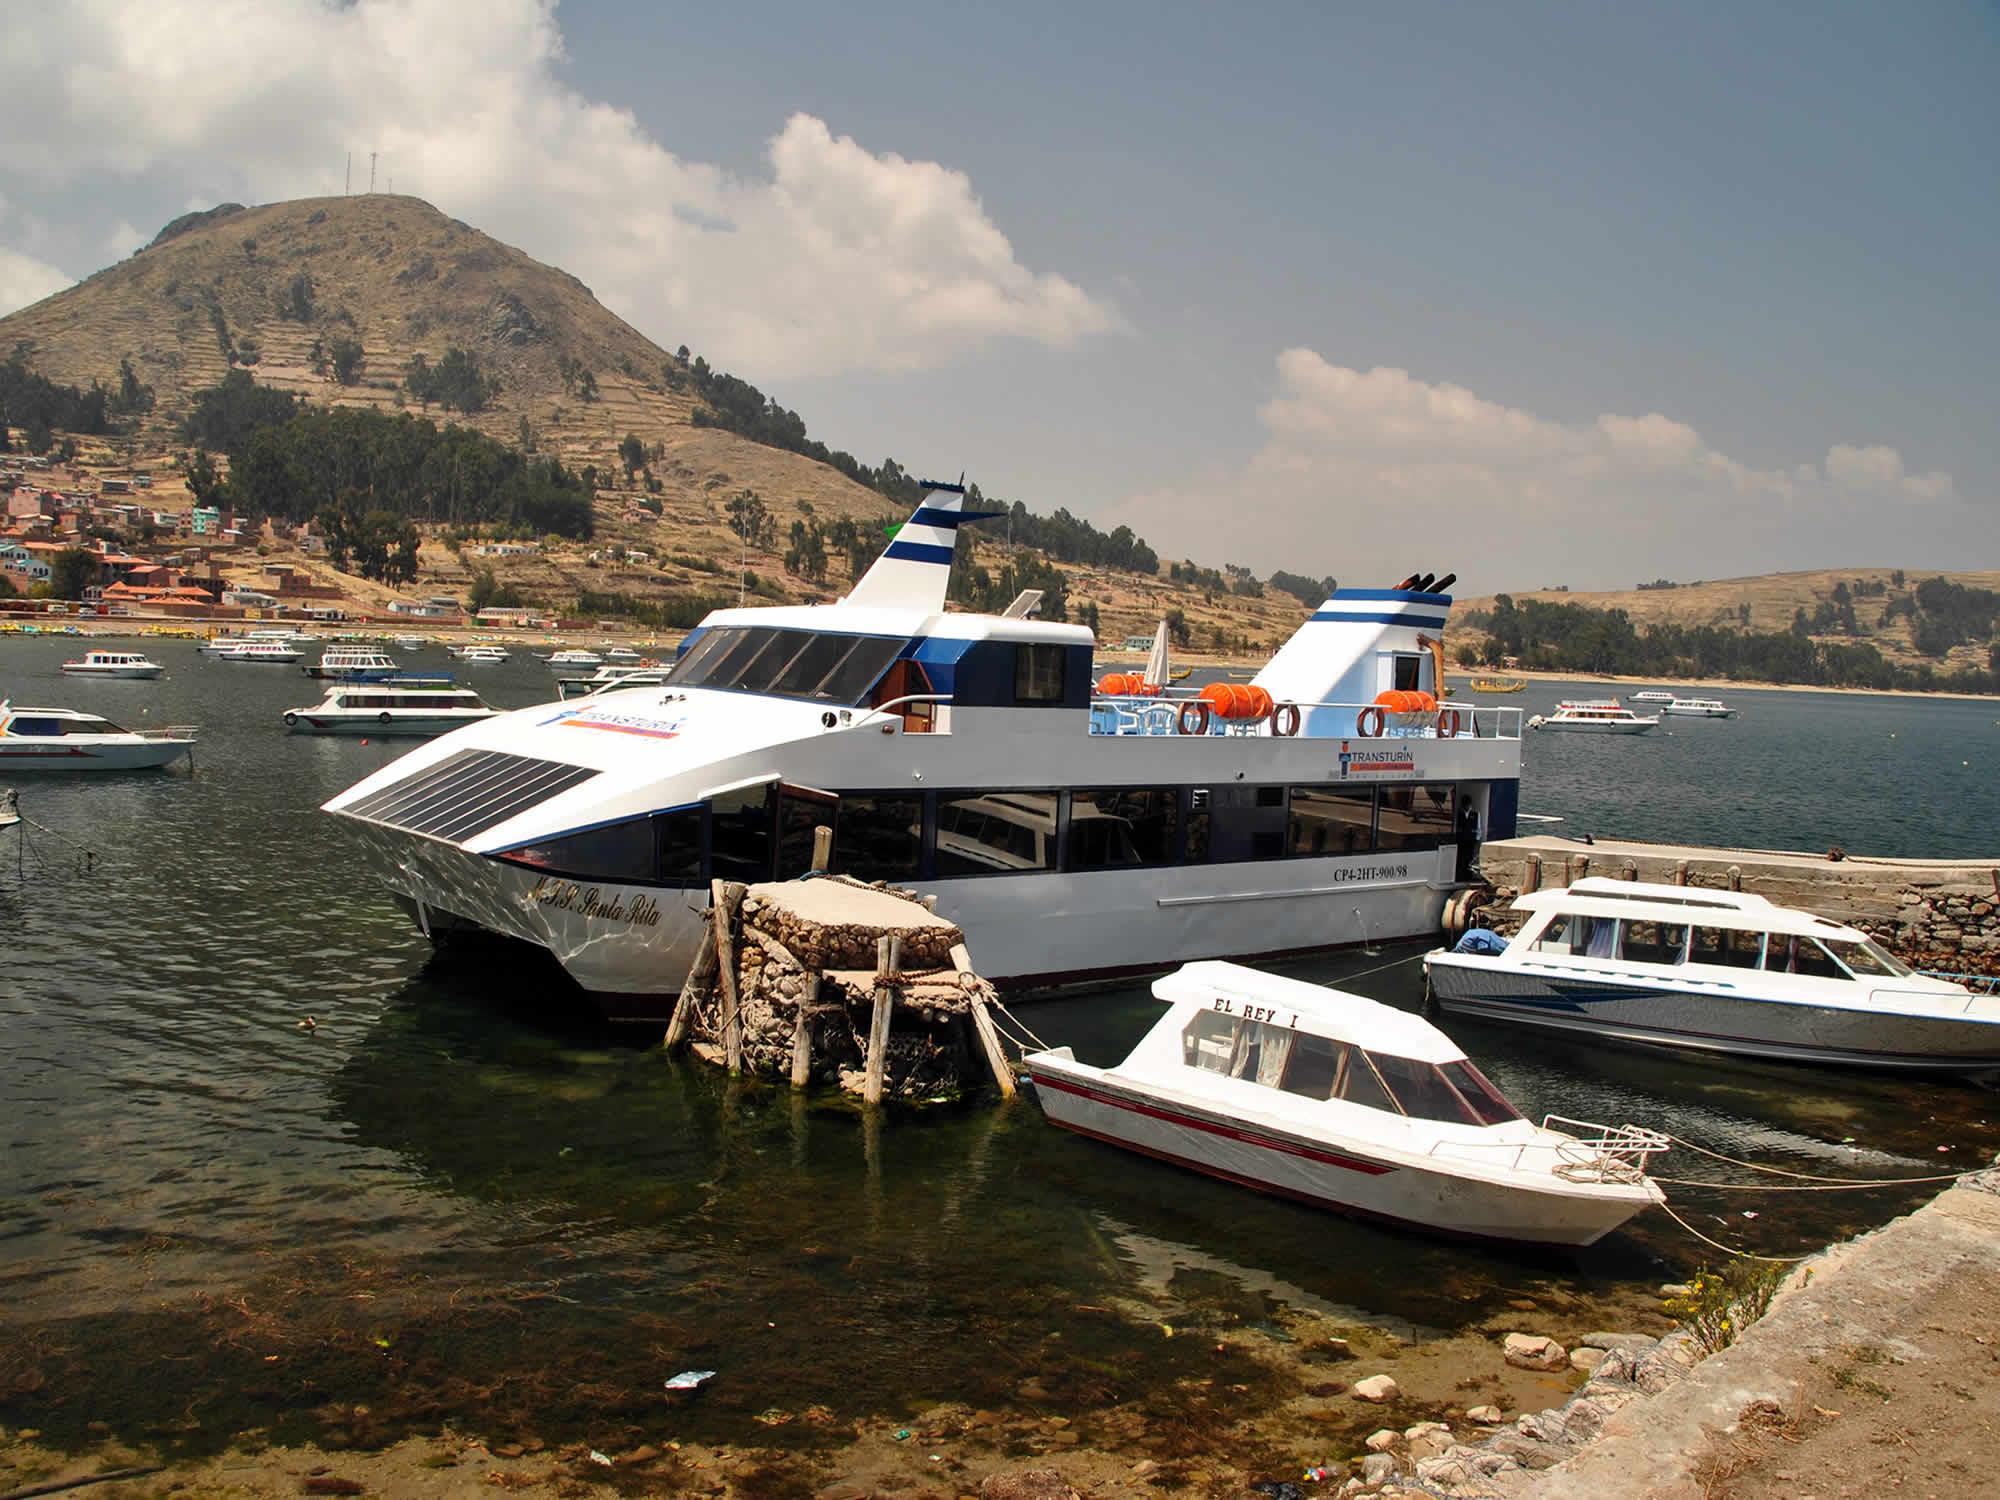 Puno - Titicaca Catamaran Day Cruise, La Paz